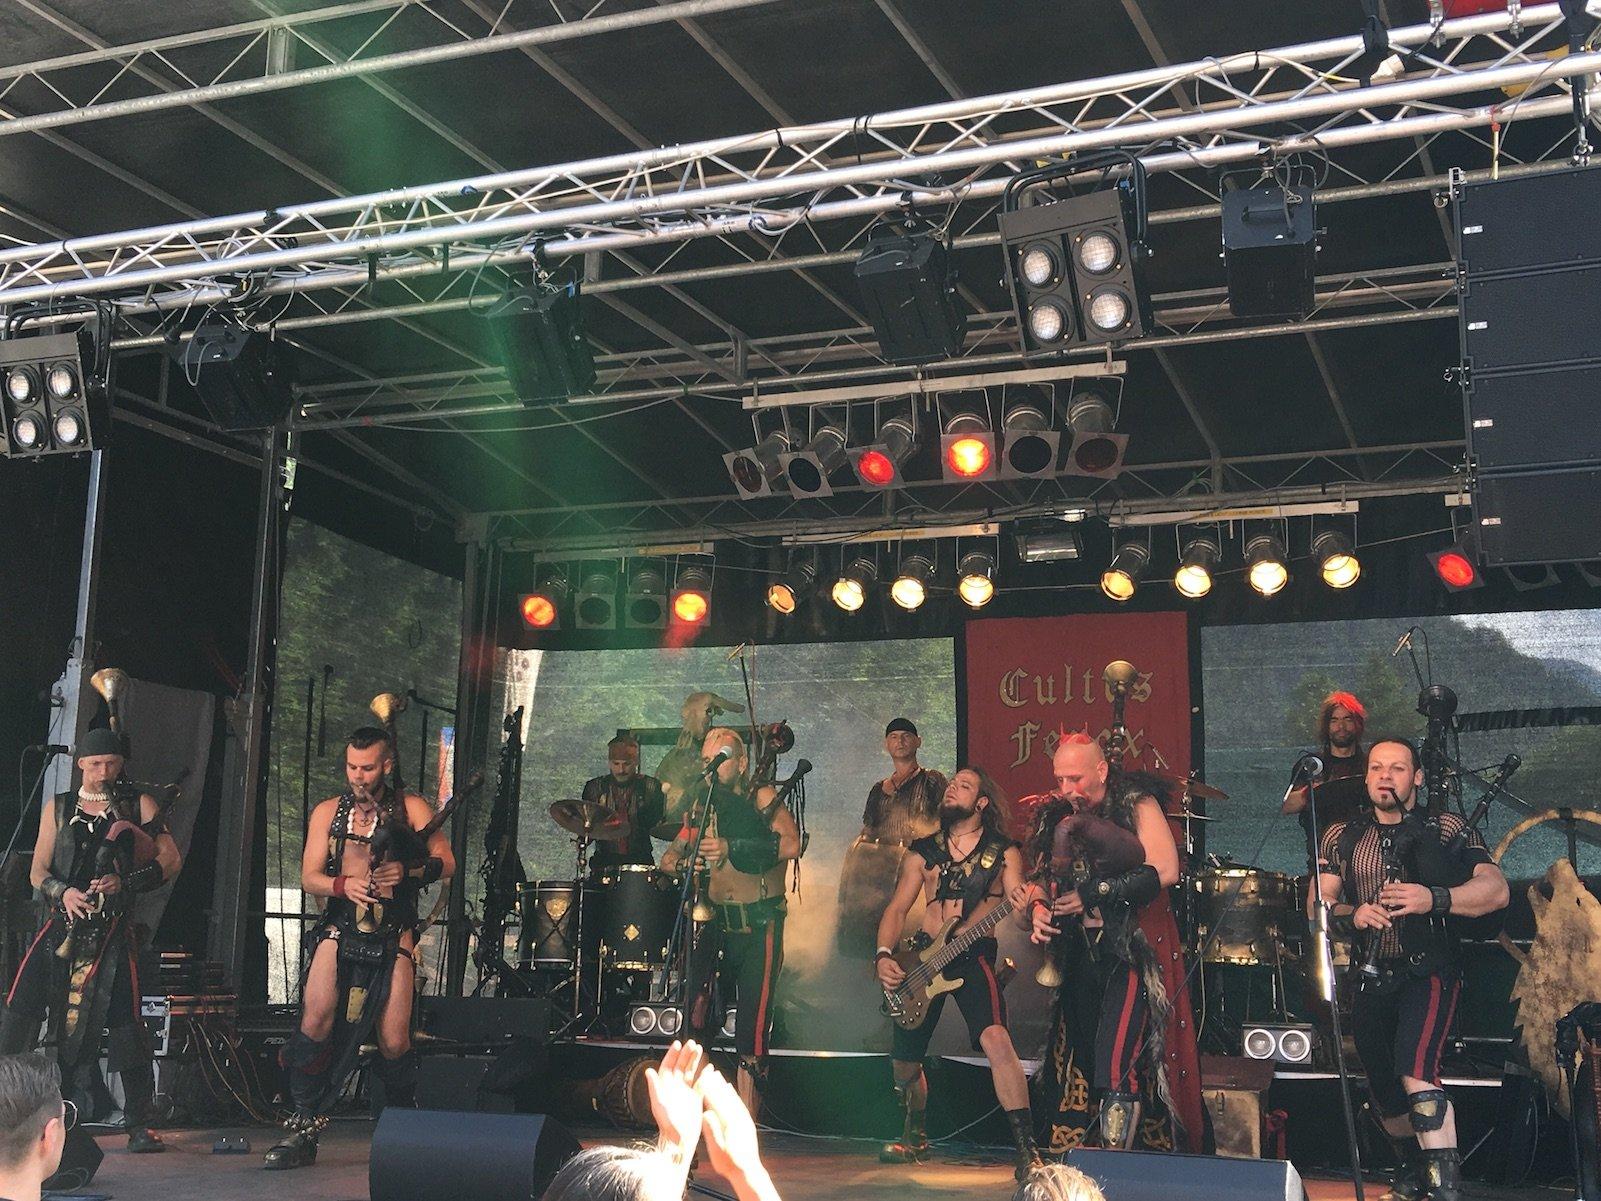 Cultus Ferox in conercert auf den Ehrenberg Ritterspielen in Reutte